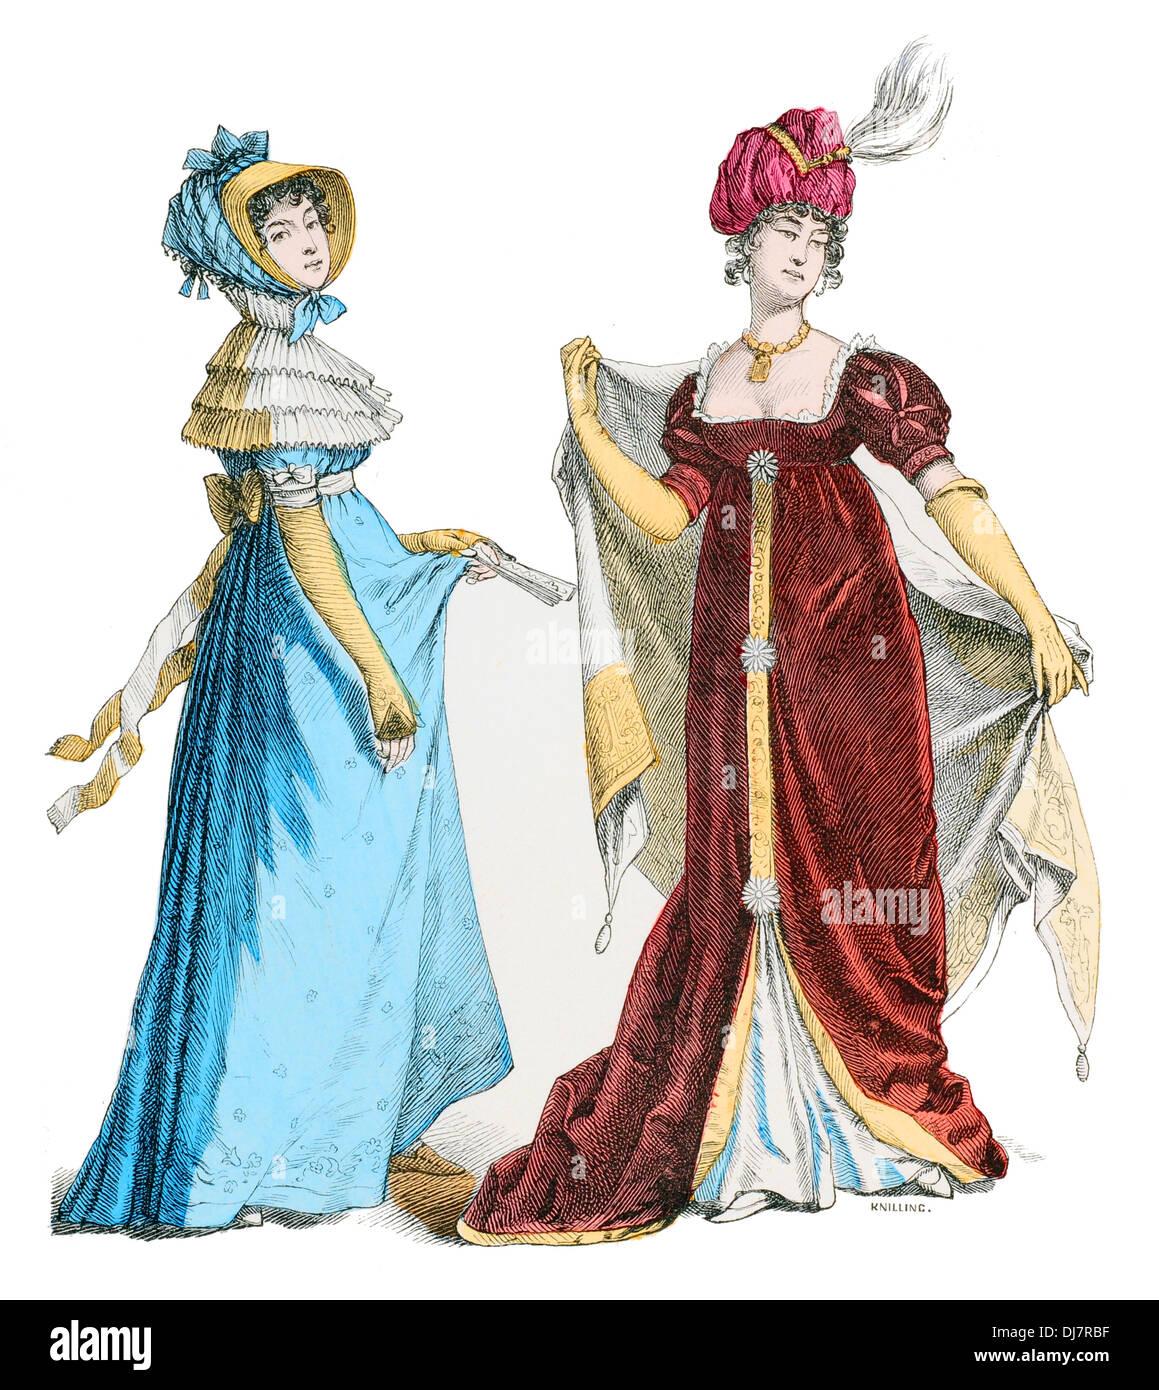 19. jahrhundert kostüme xix frankreich gericht robe